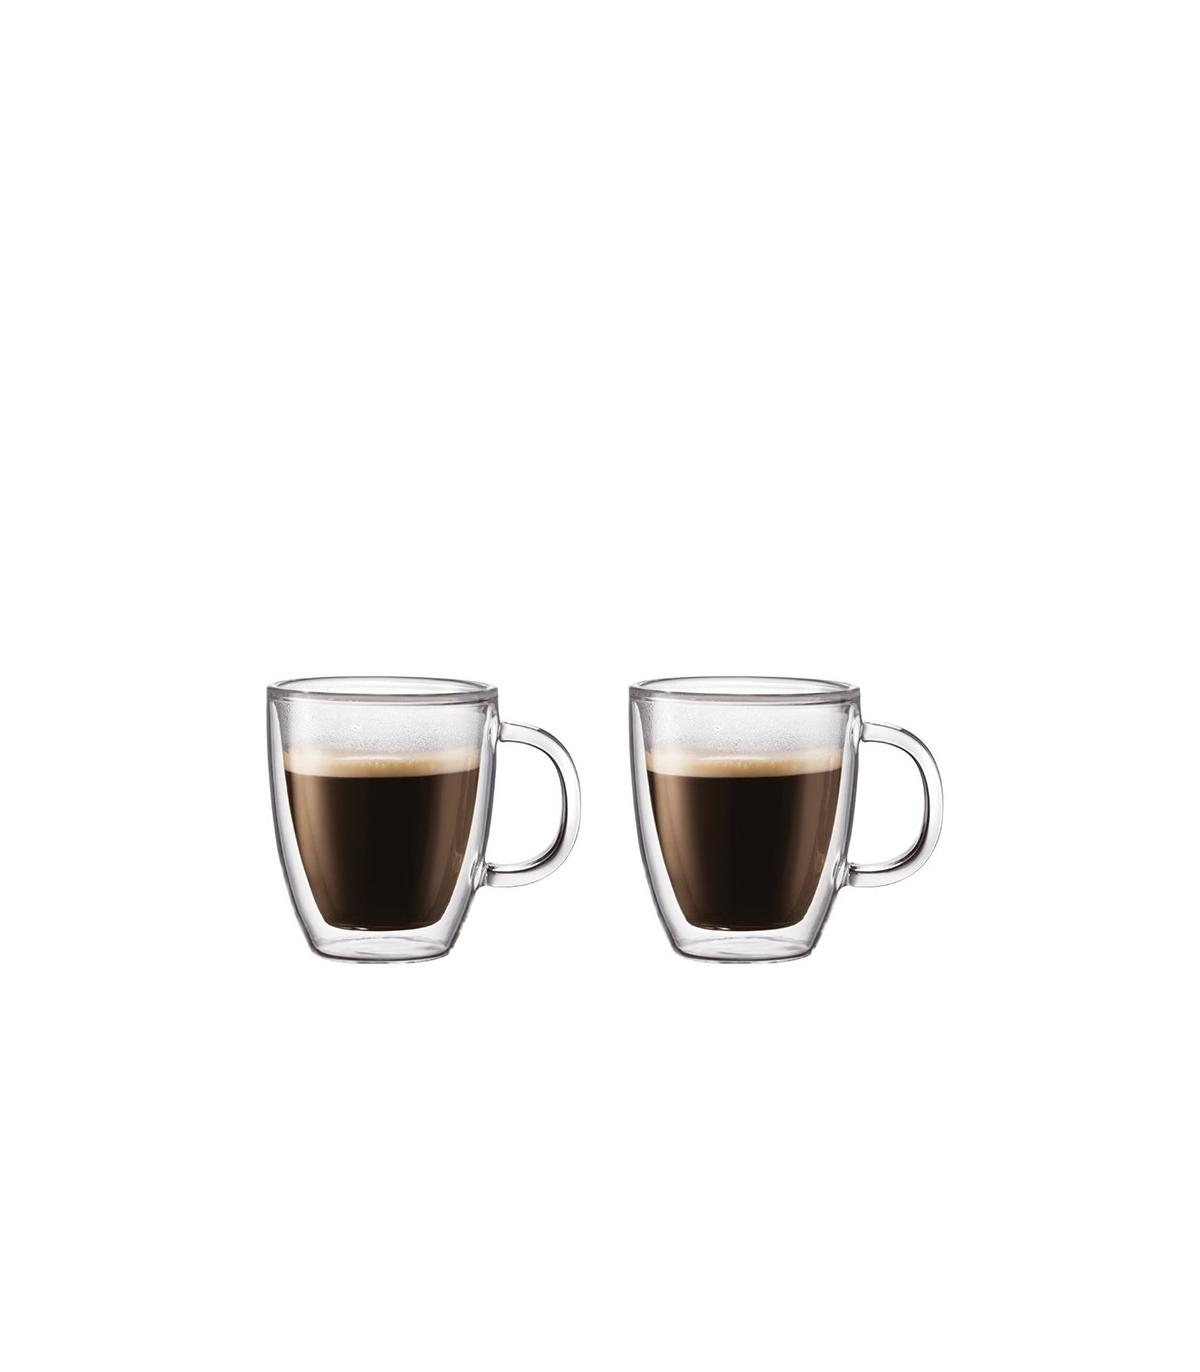 set de 2 mugs bodum bistro tasses verre double paroi 0 3l